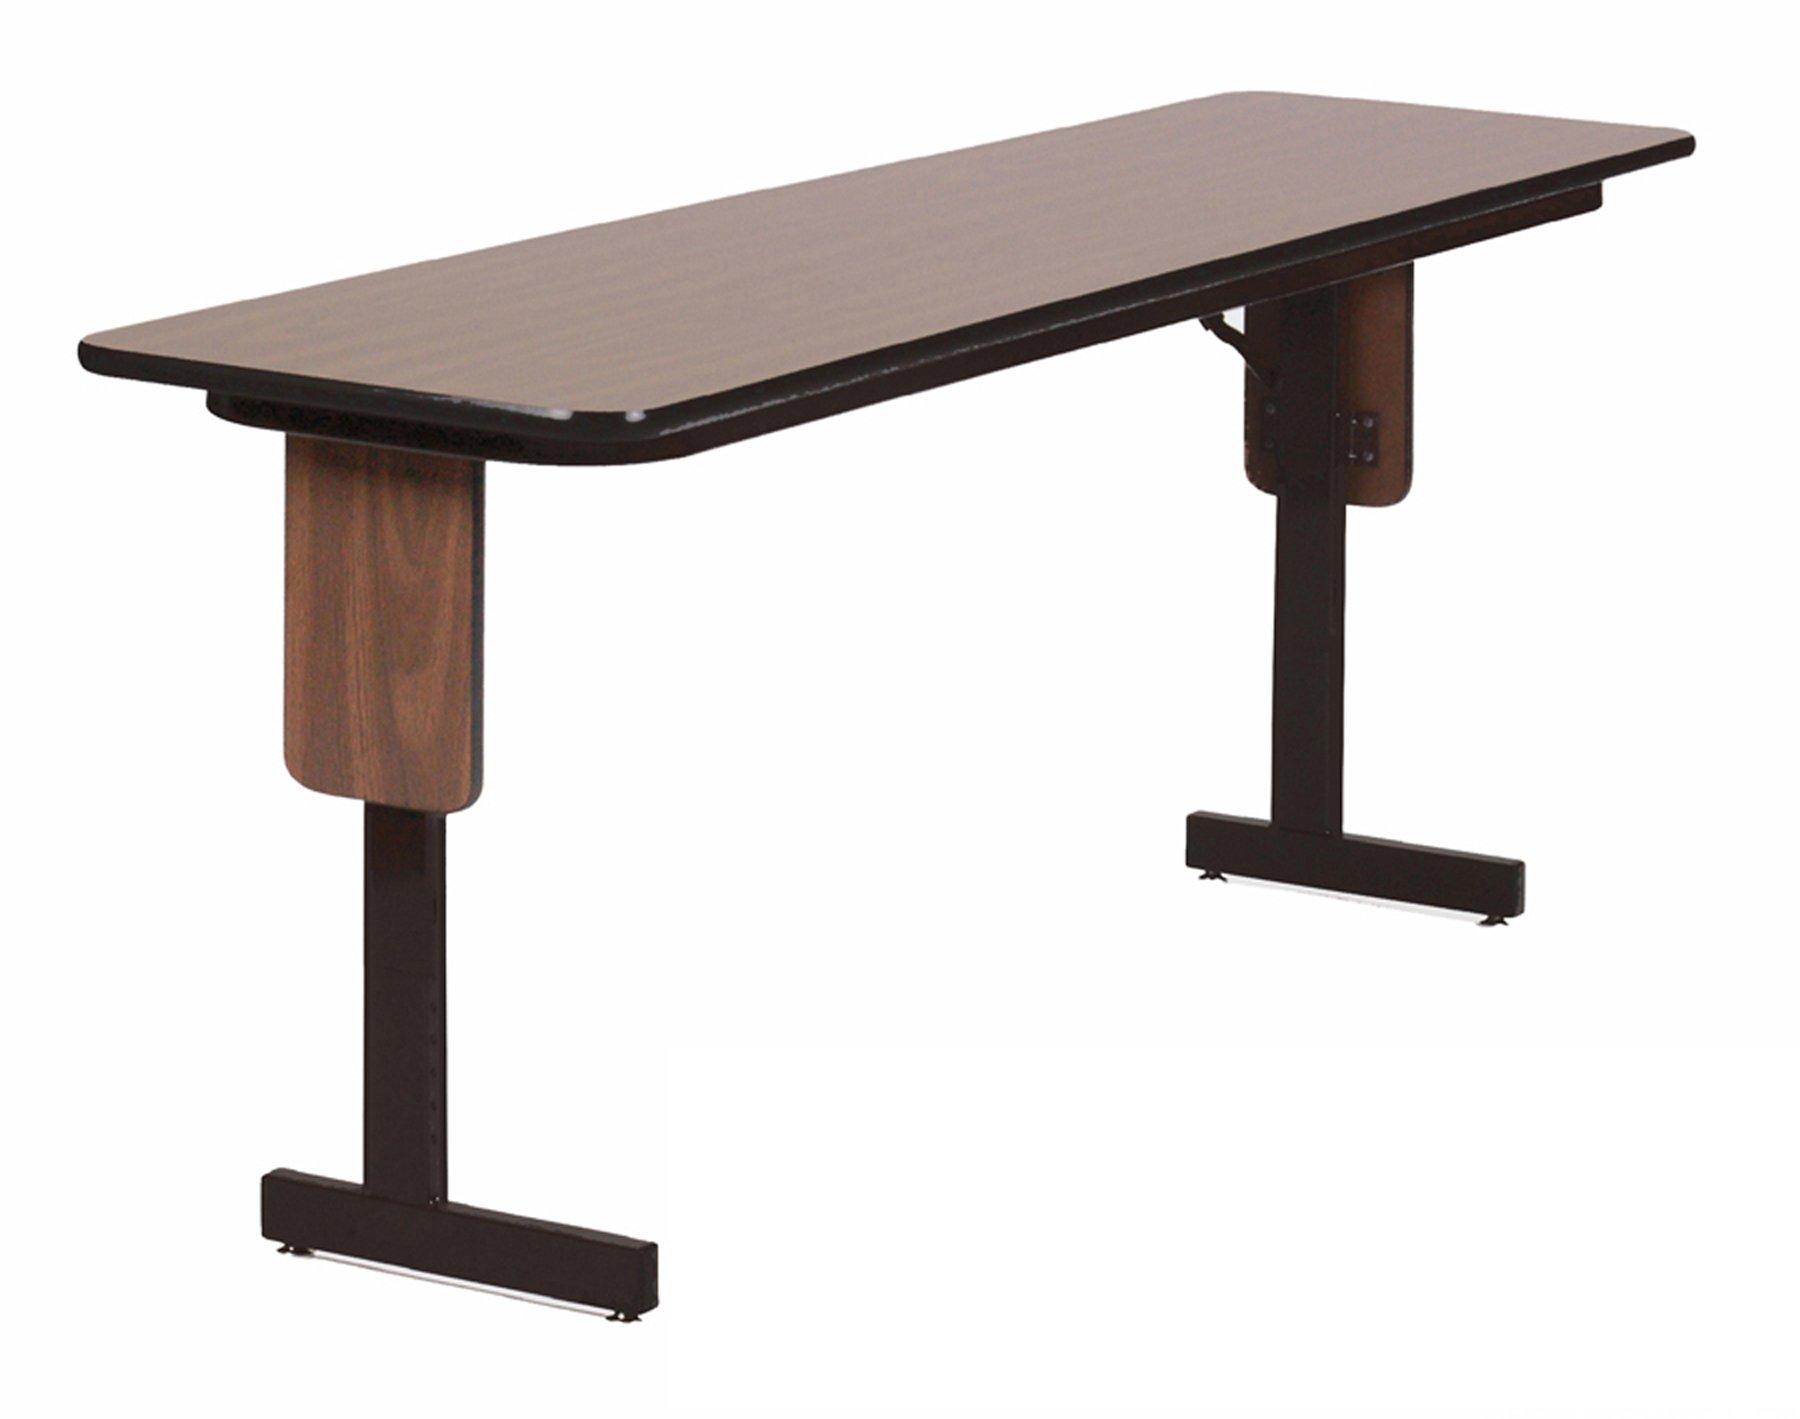 Correll SP1896PX-01 High Pressure Laminate Classroom, Training or Seminar Table with Folding Panel Leg  , Rectangular, 18''x96'' , Seats 4, Walnut